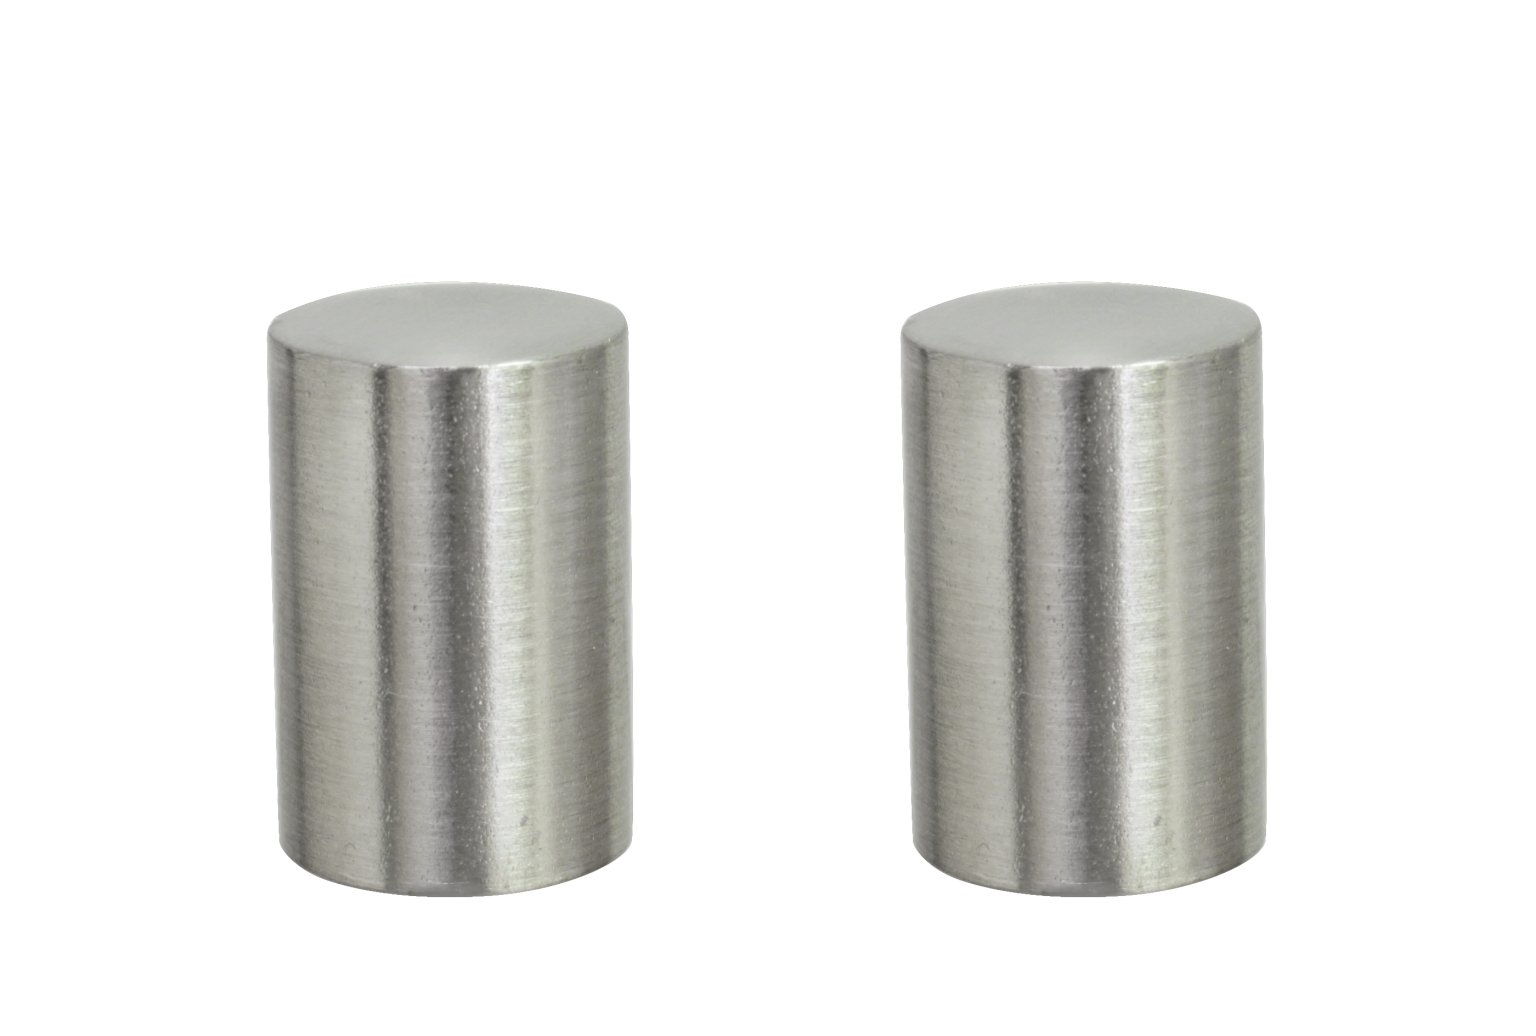 Aspen Creative 24019-22 Steel Lamp Finial Finish, 1 1/4'' Tall (2), 2 Pack, Brushed Nickel